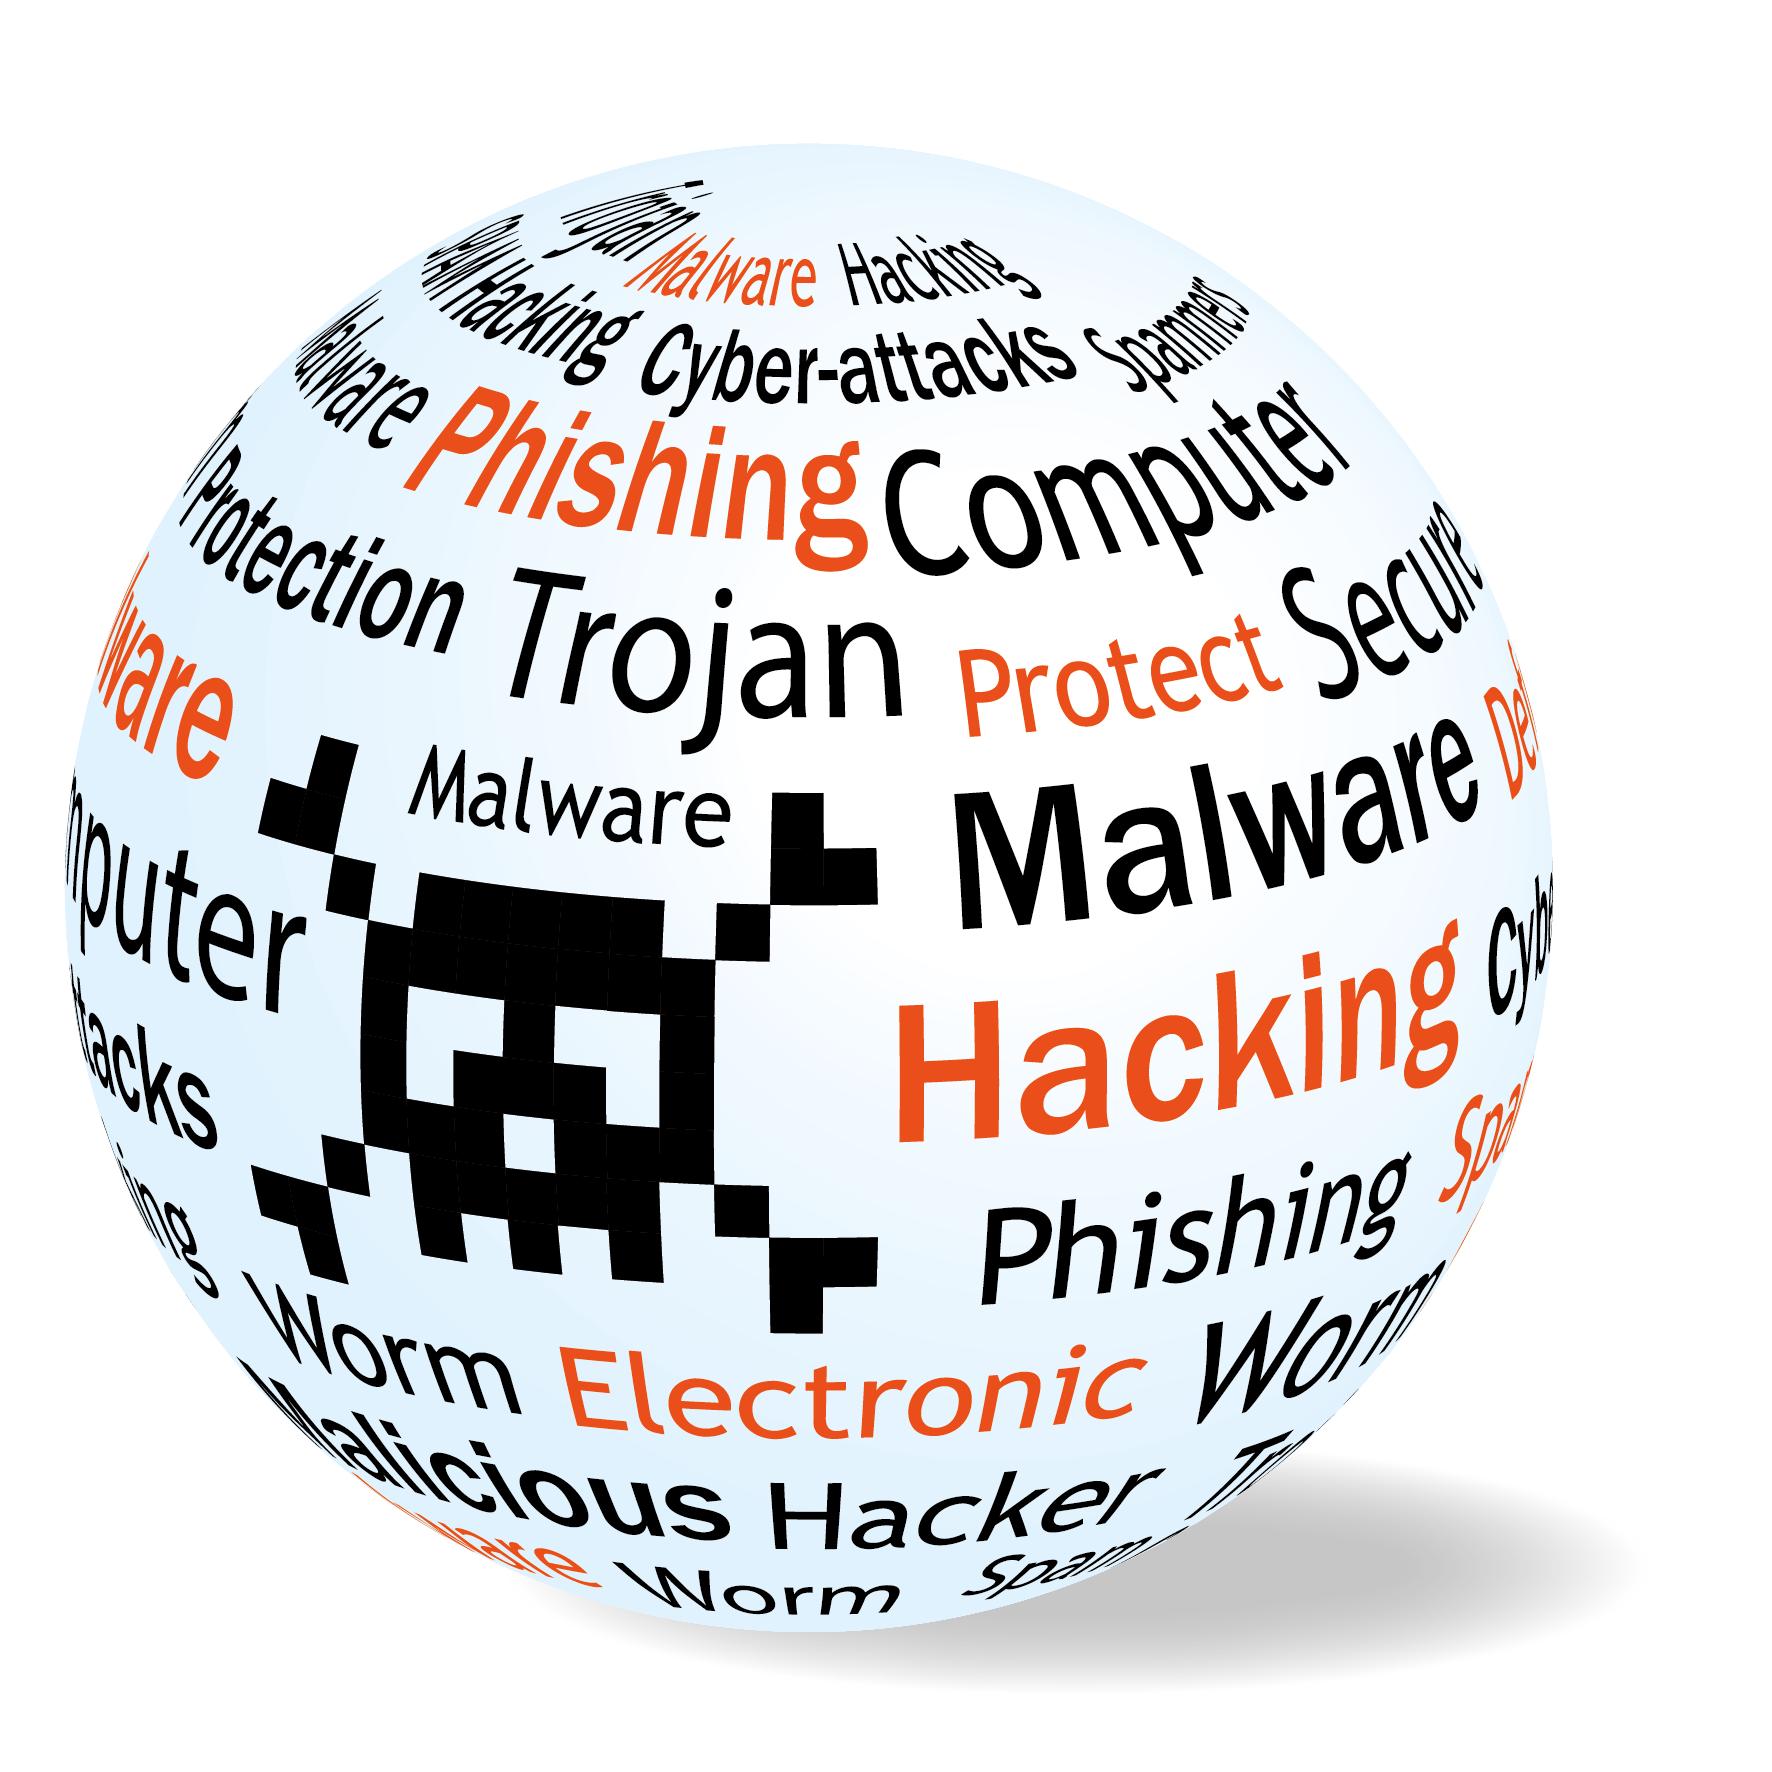 World of hacking